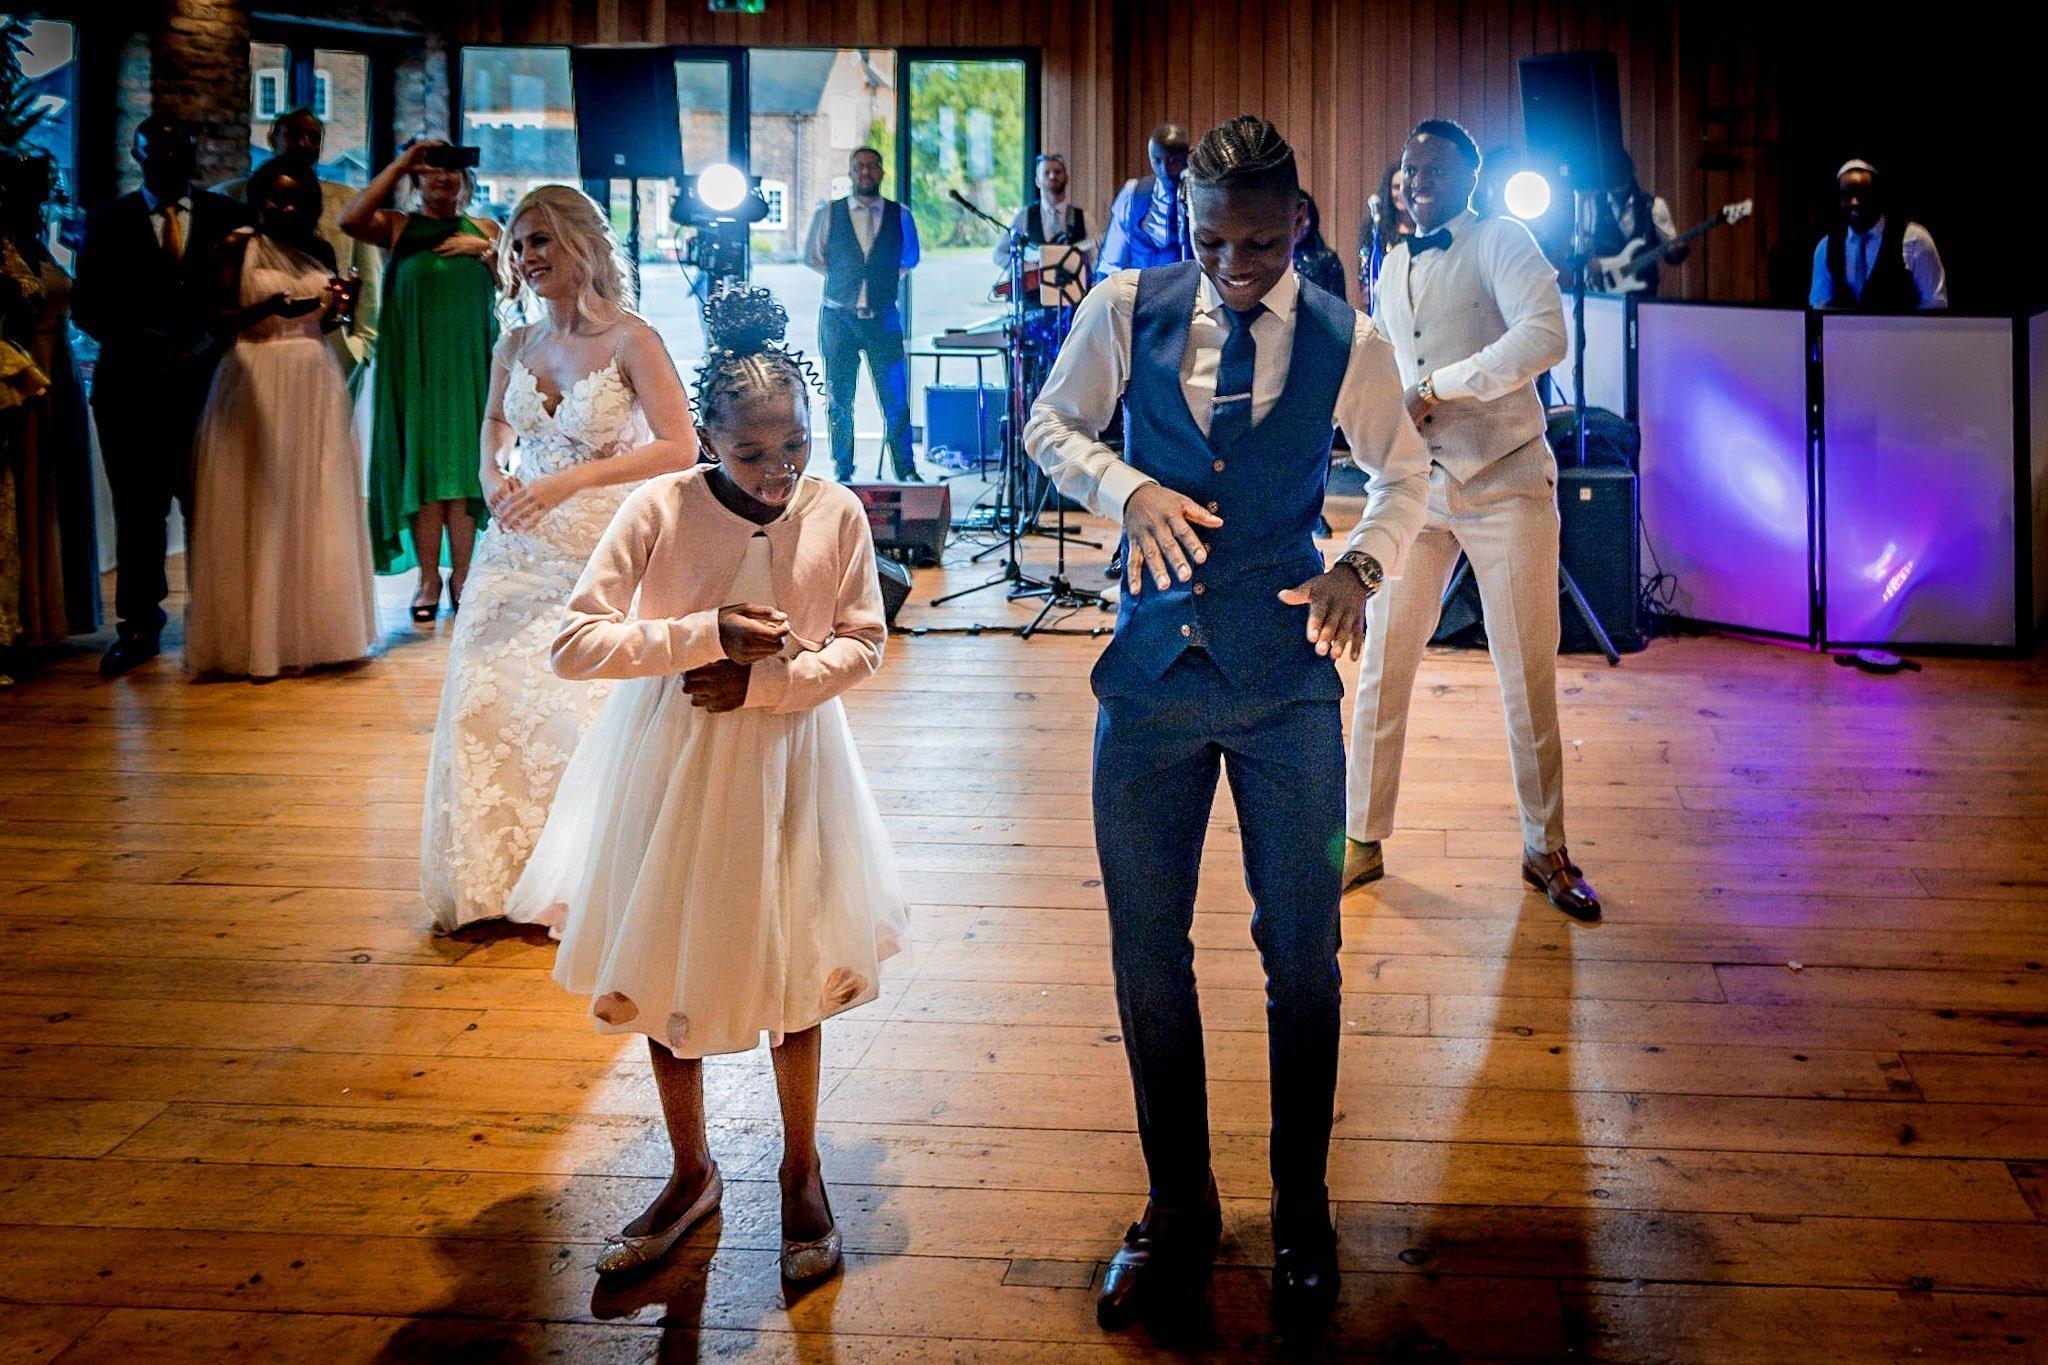 Your Favourite Frame YFFUK Mwasuku Norton Fields Atherstone flash dance groom bride and family